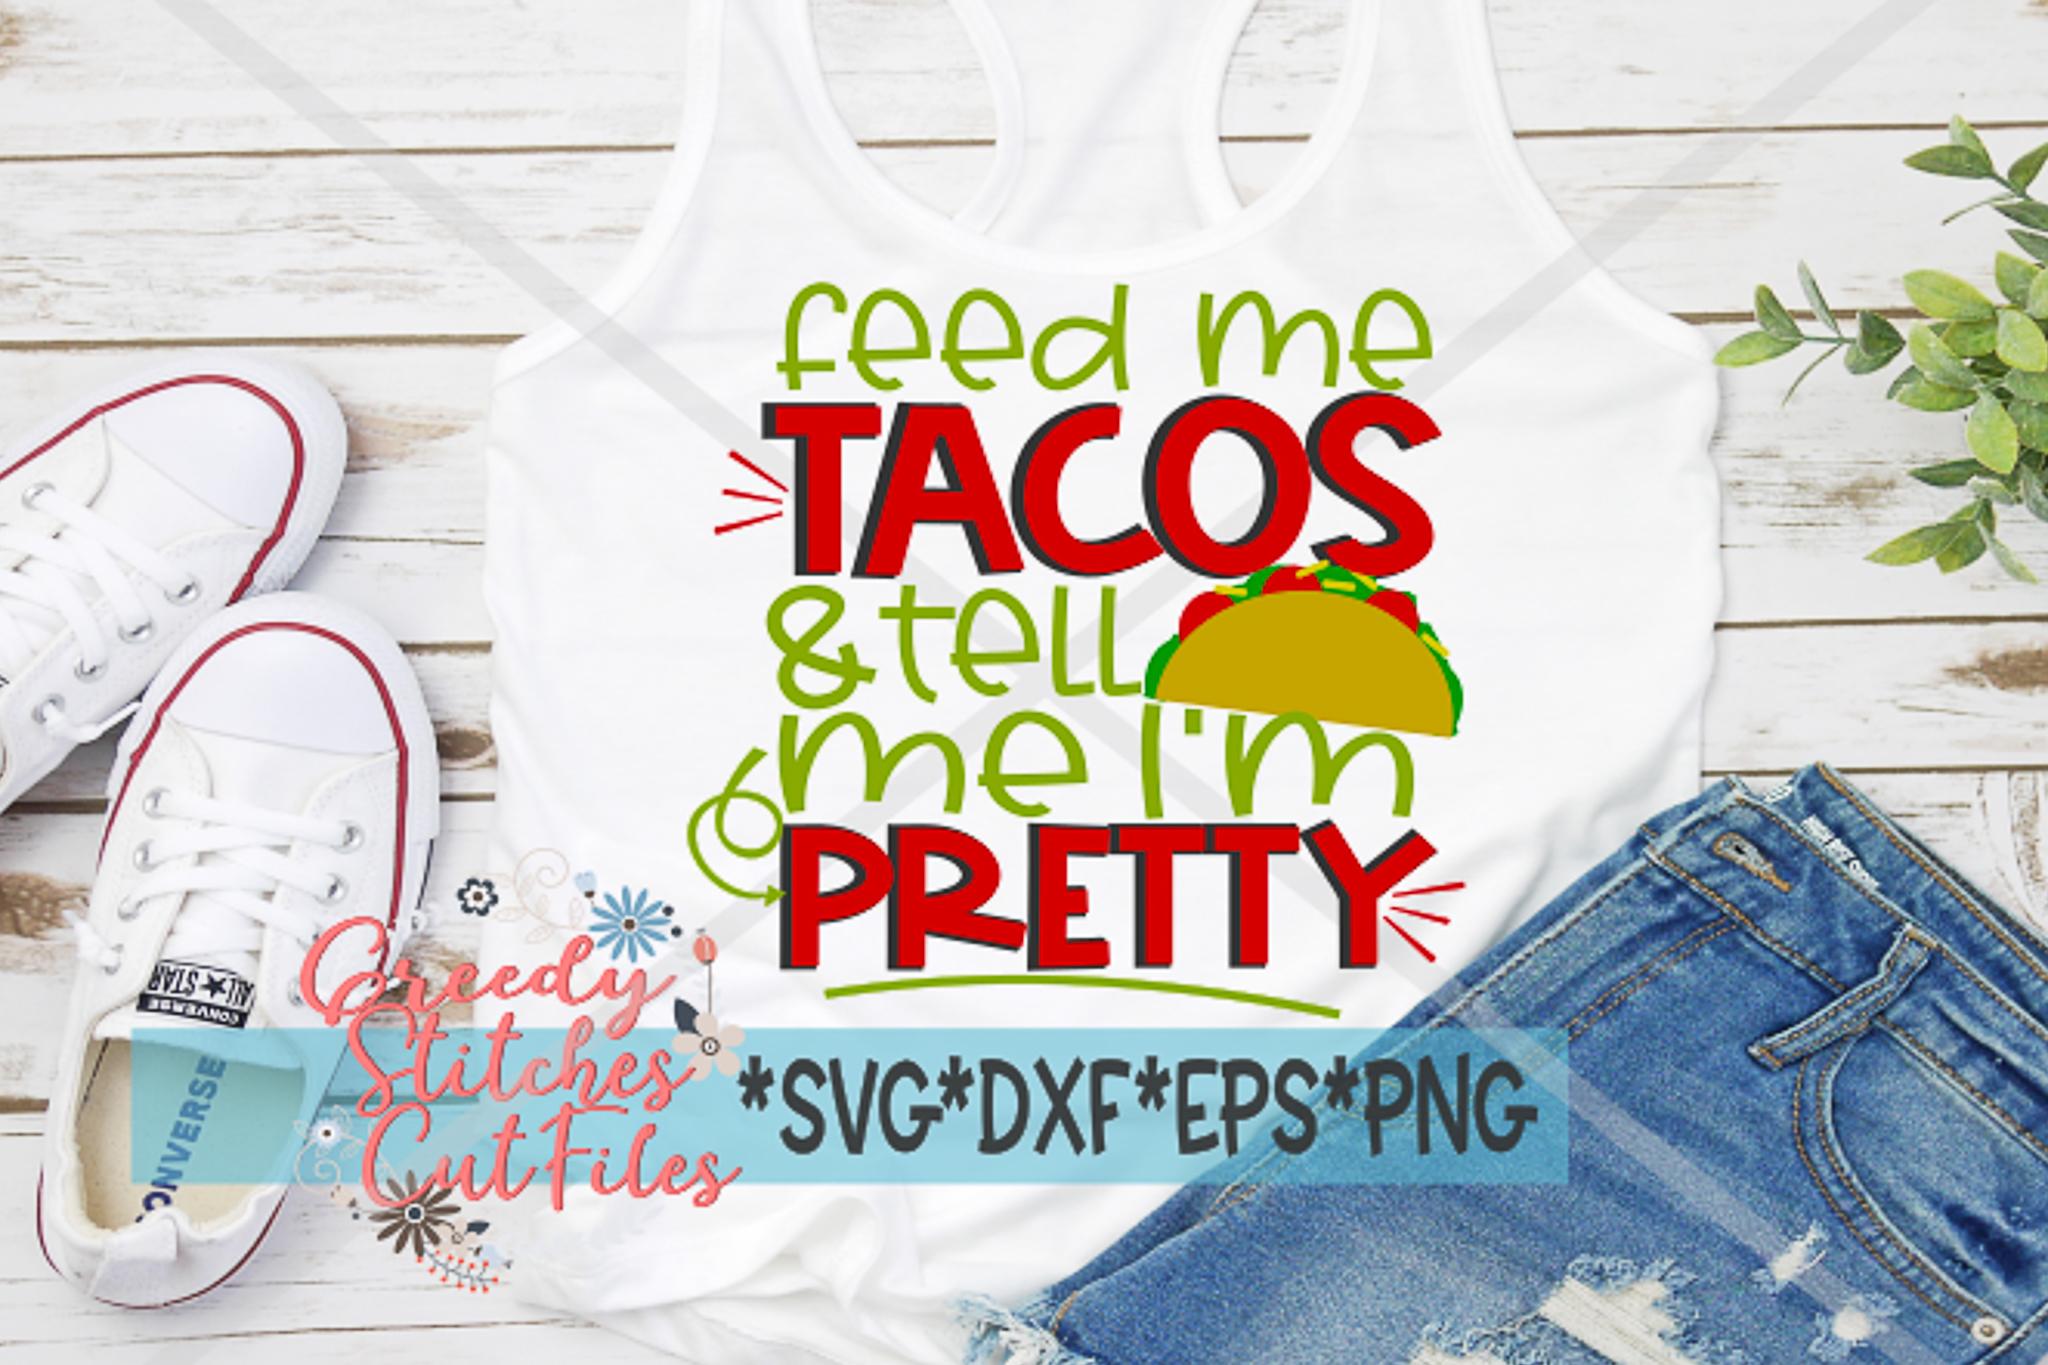 Cinco de Mayo | Feed Me Tacos & Tell Me I'm Pretty svg example image 6